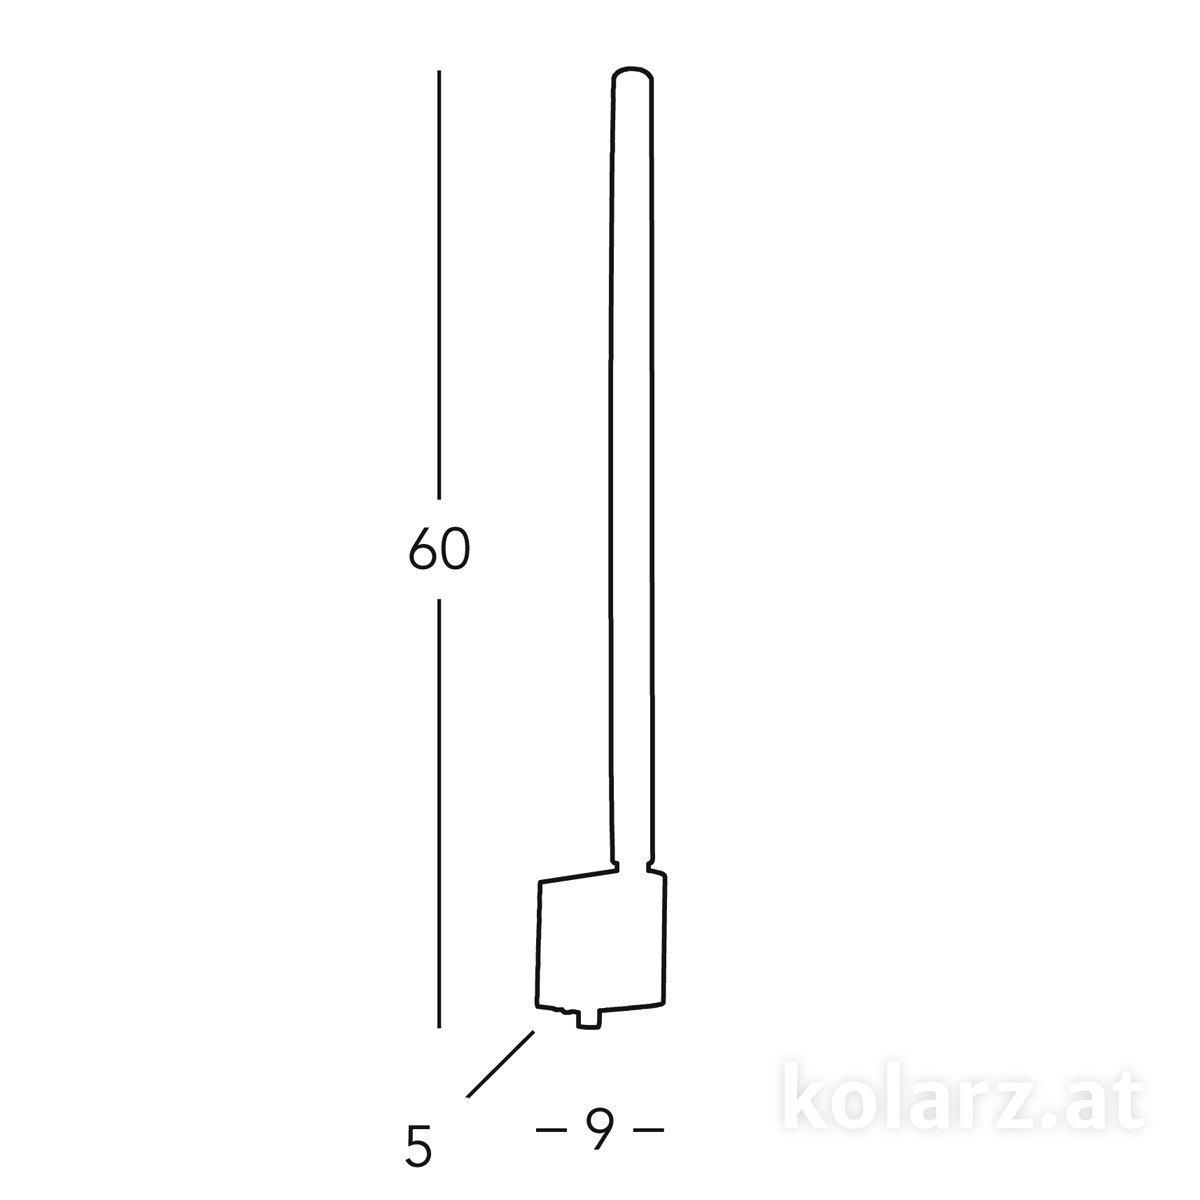 A1303-61-7__60-s1.jpg